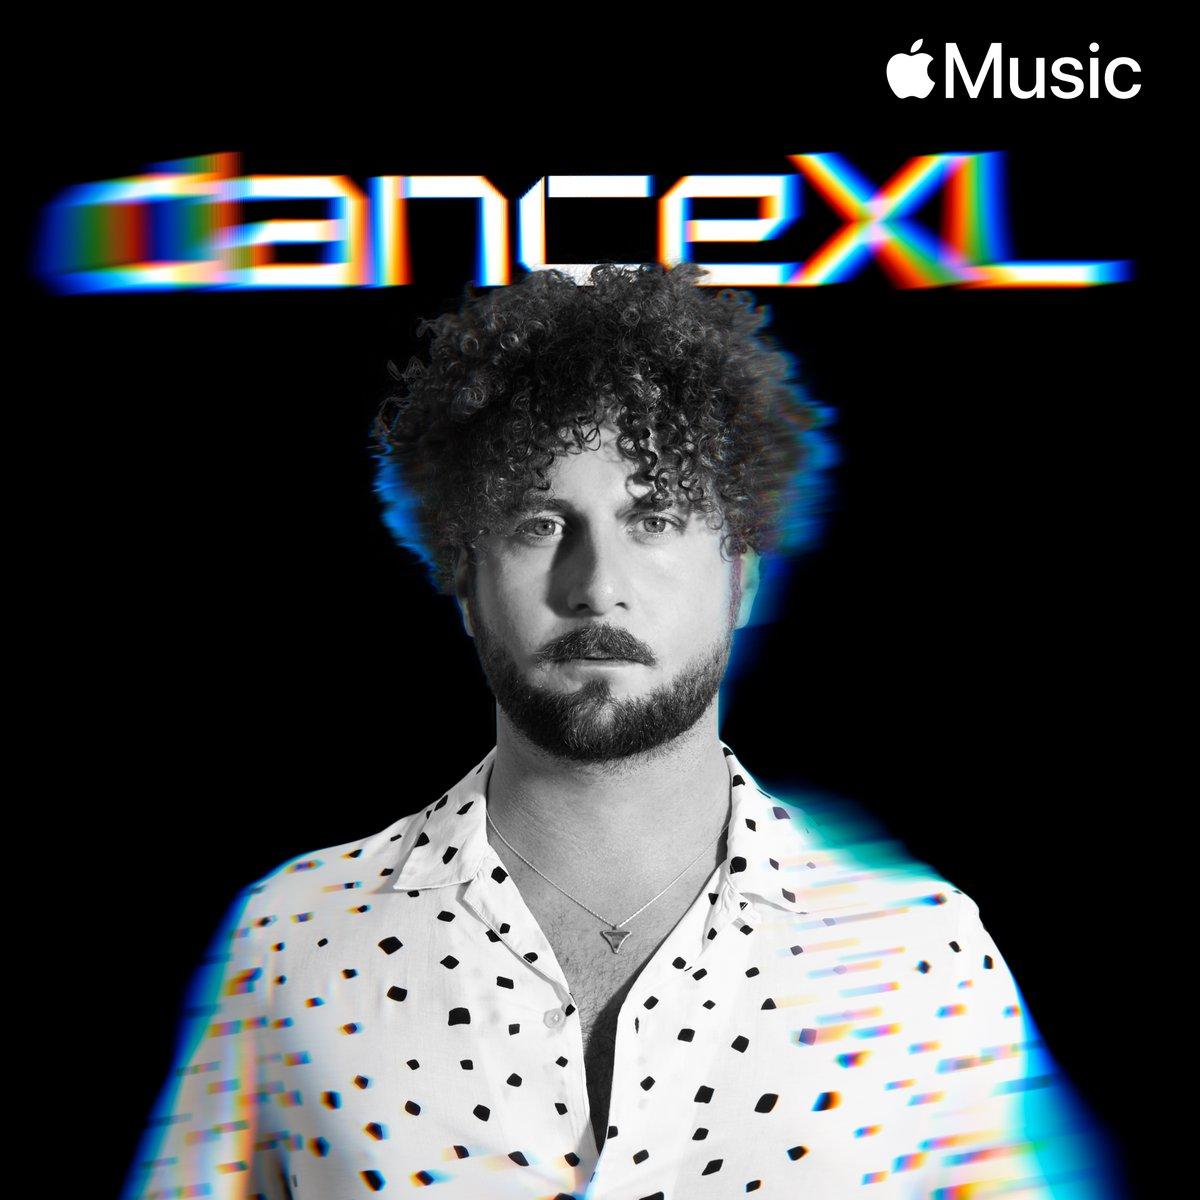 Big shout out to @AppleMusic You can listen to Broken Mirror now on #danceXL playlist! 🔥🔥🔥 apple.co/ElderbrookOnda…